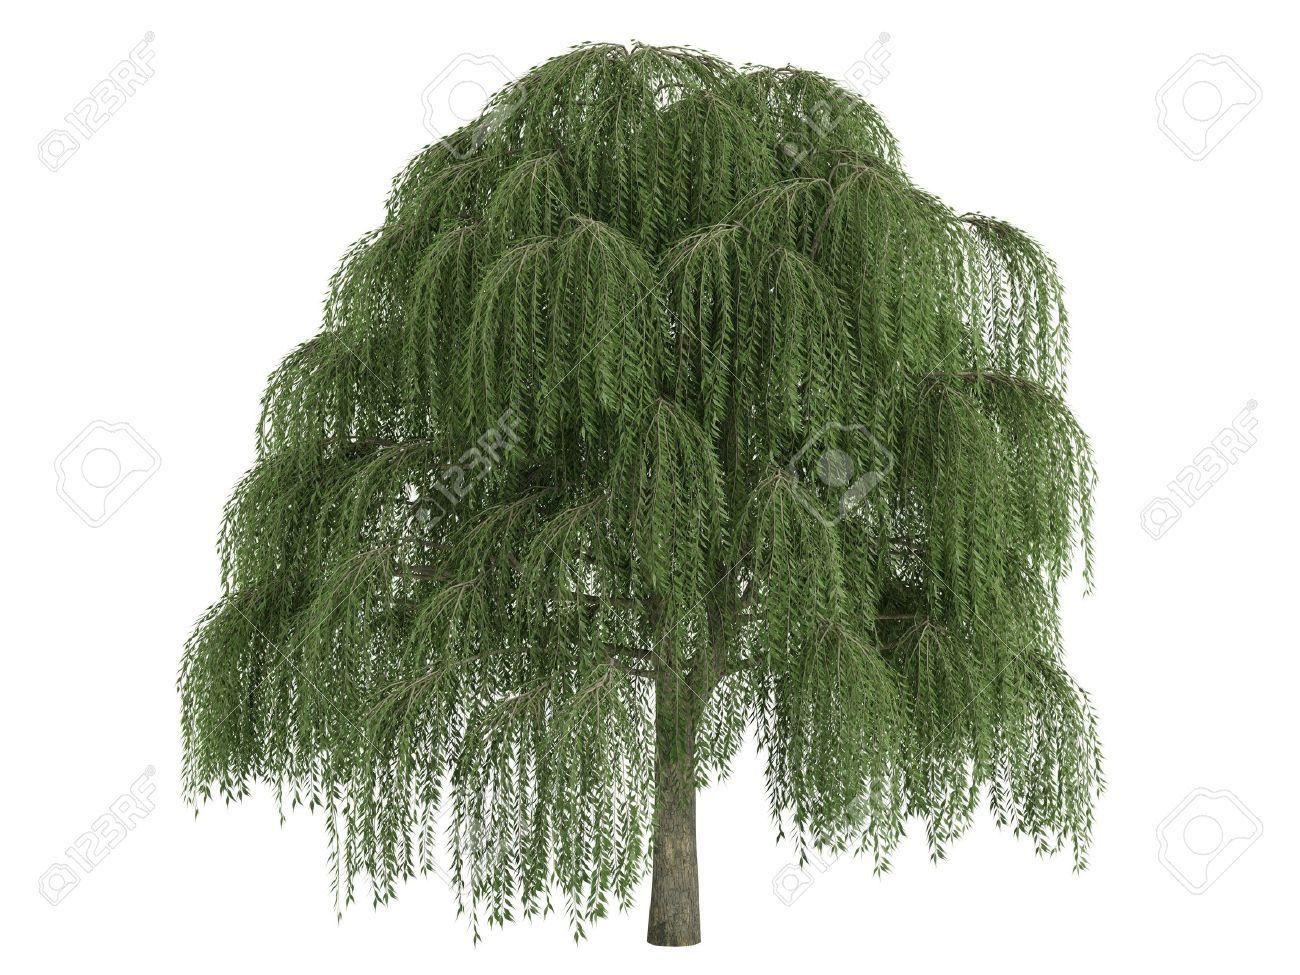 1300x975 Primitive Willow Tree Vector